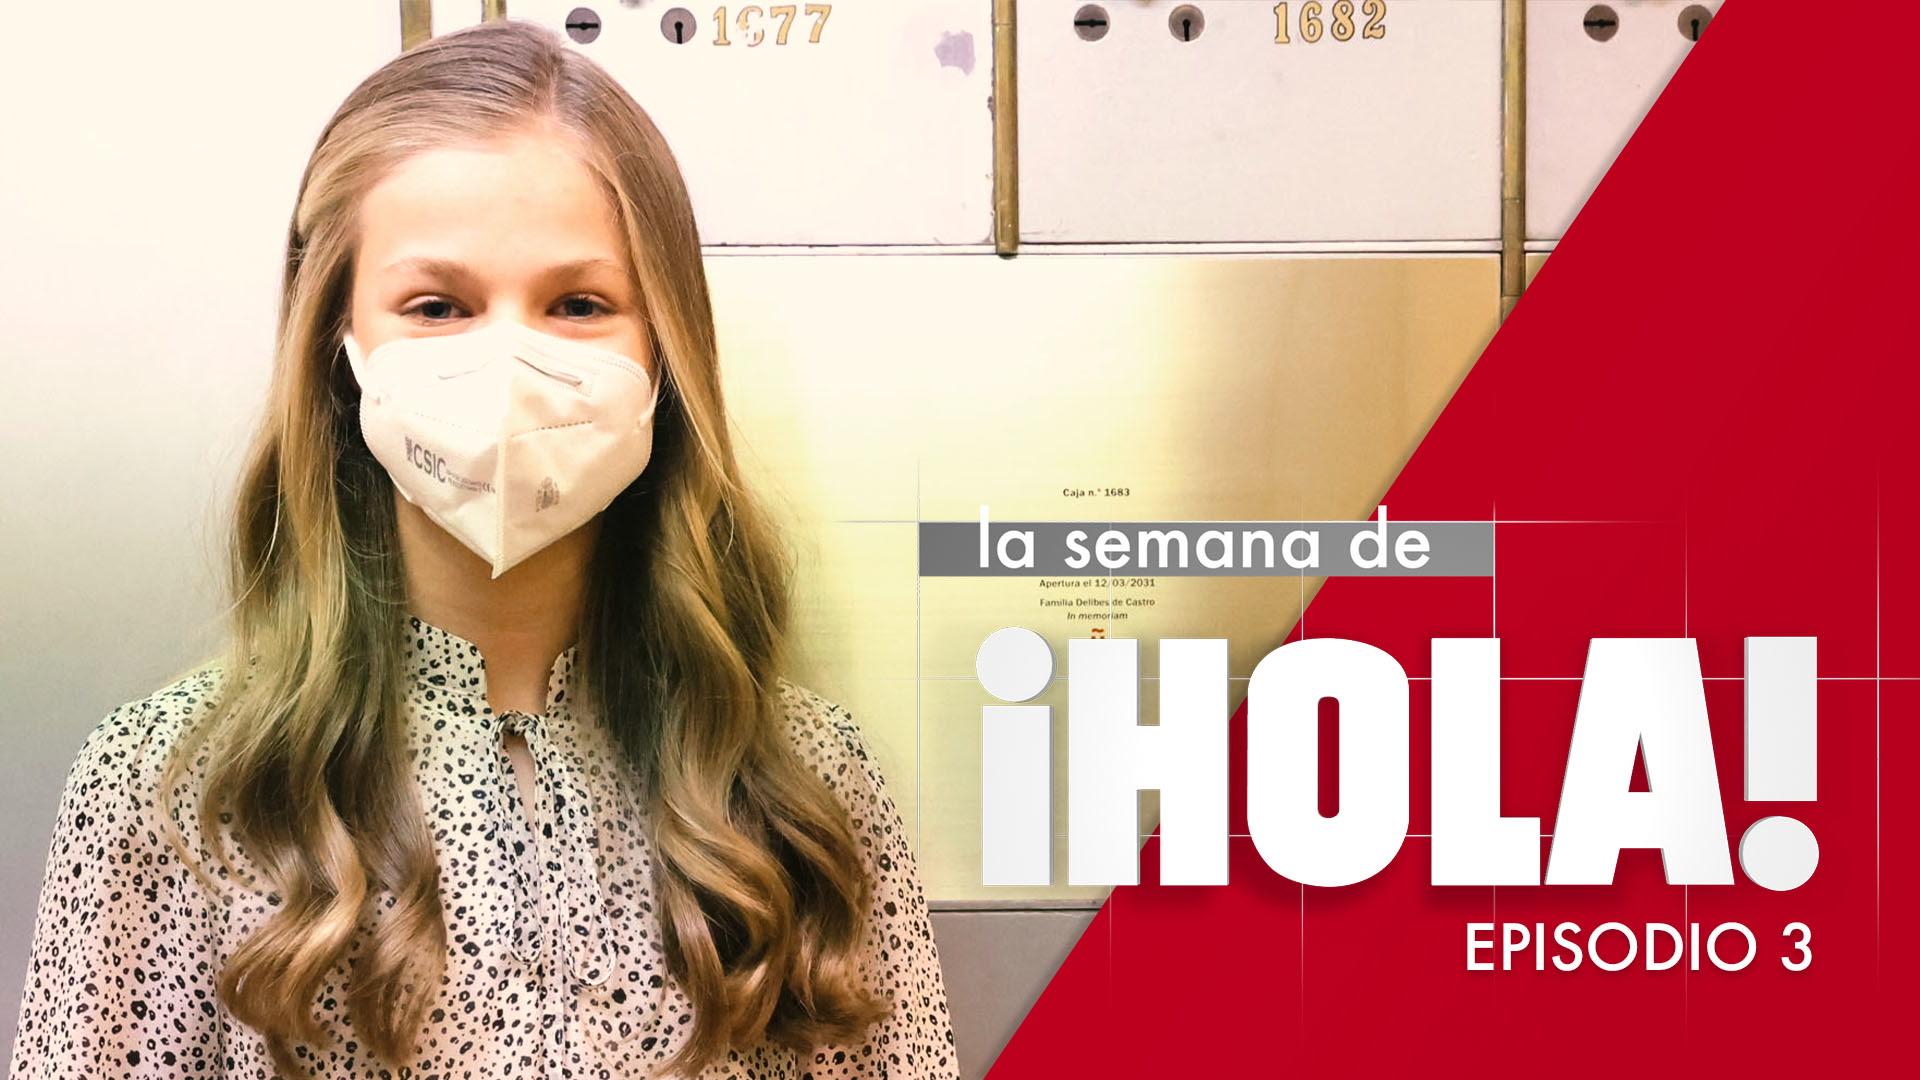 La semana de ¡HOLA! - Episodio 3